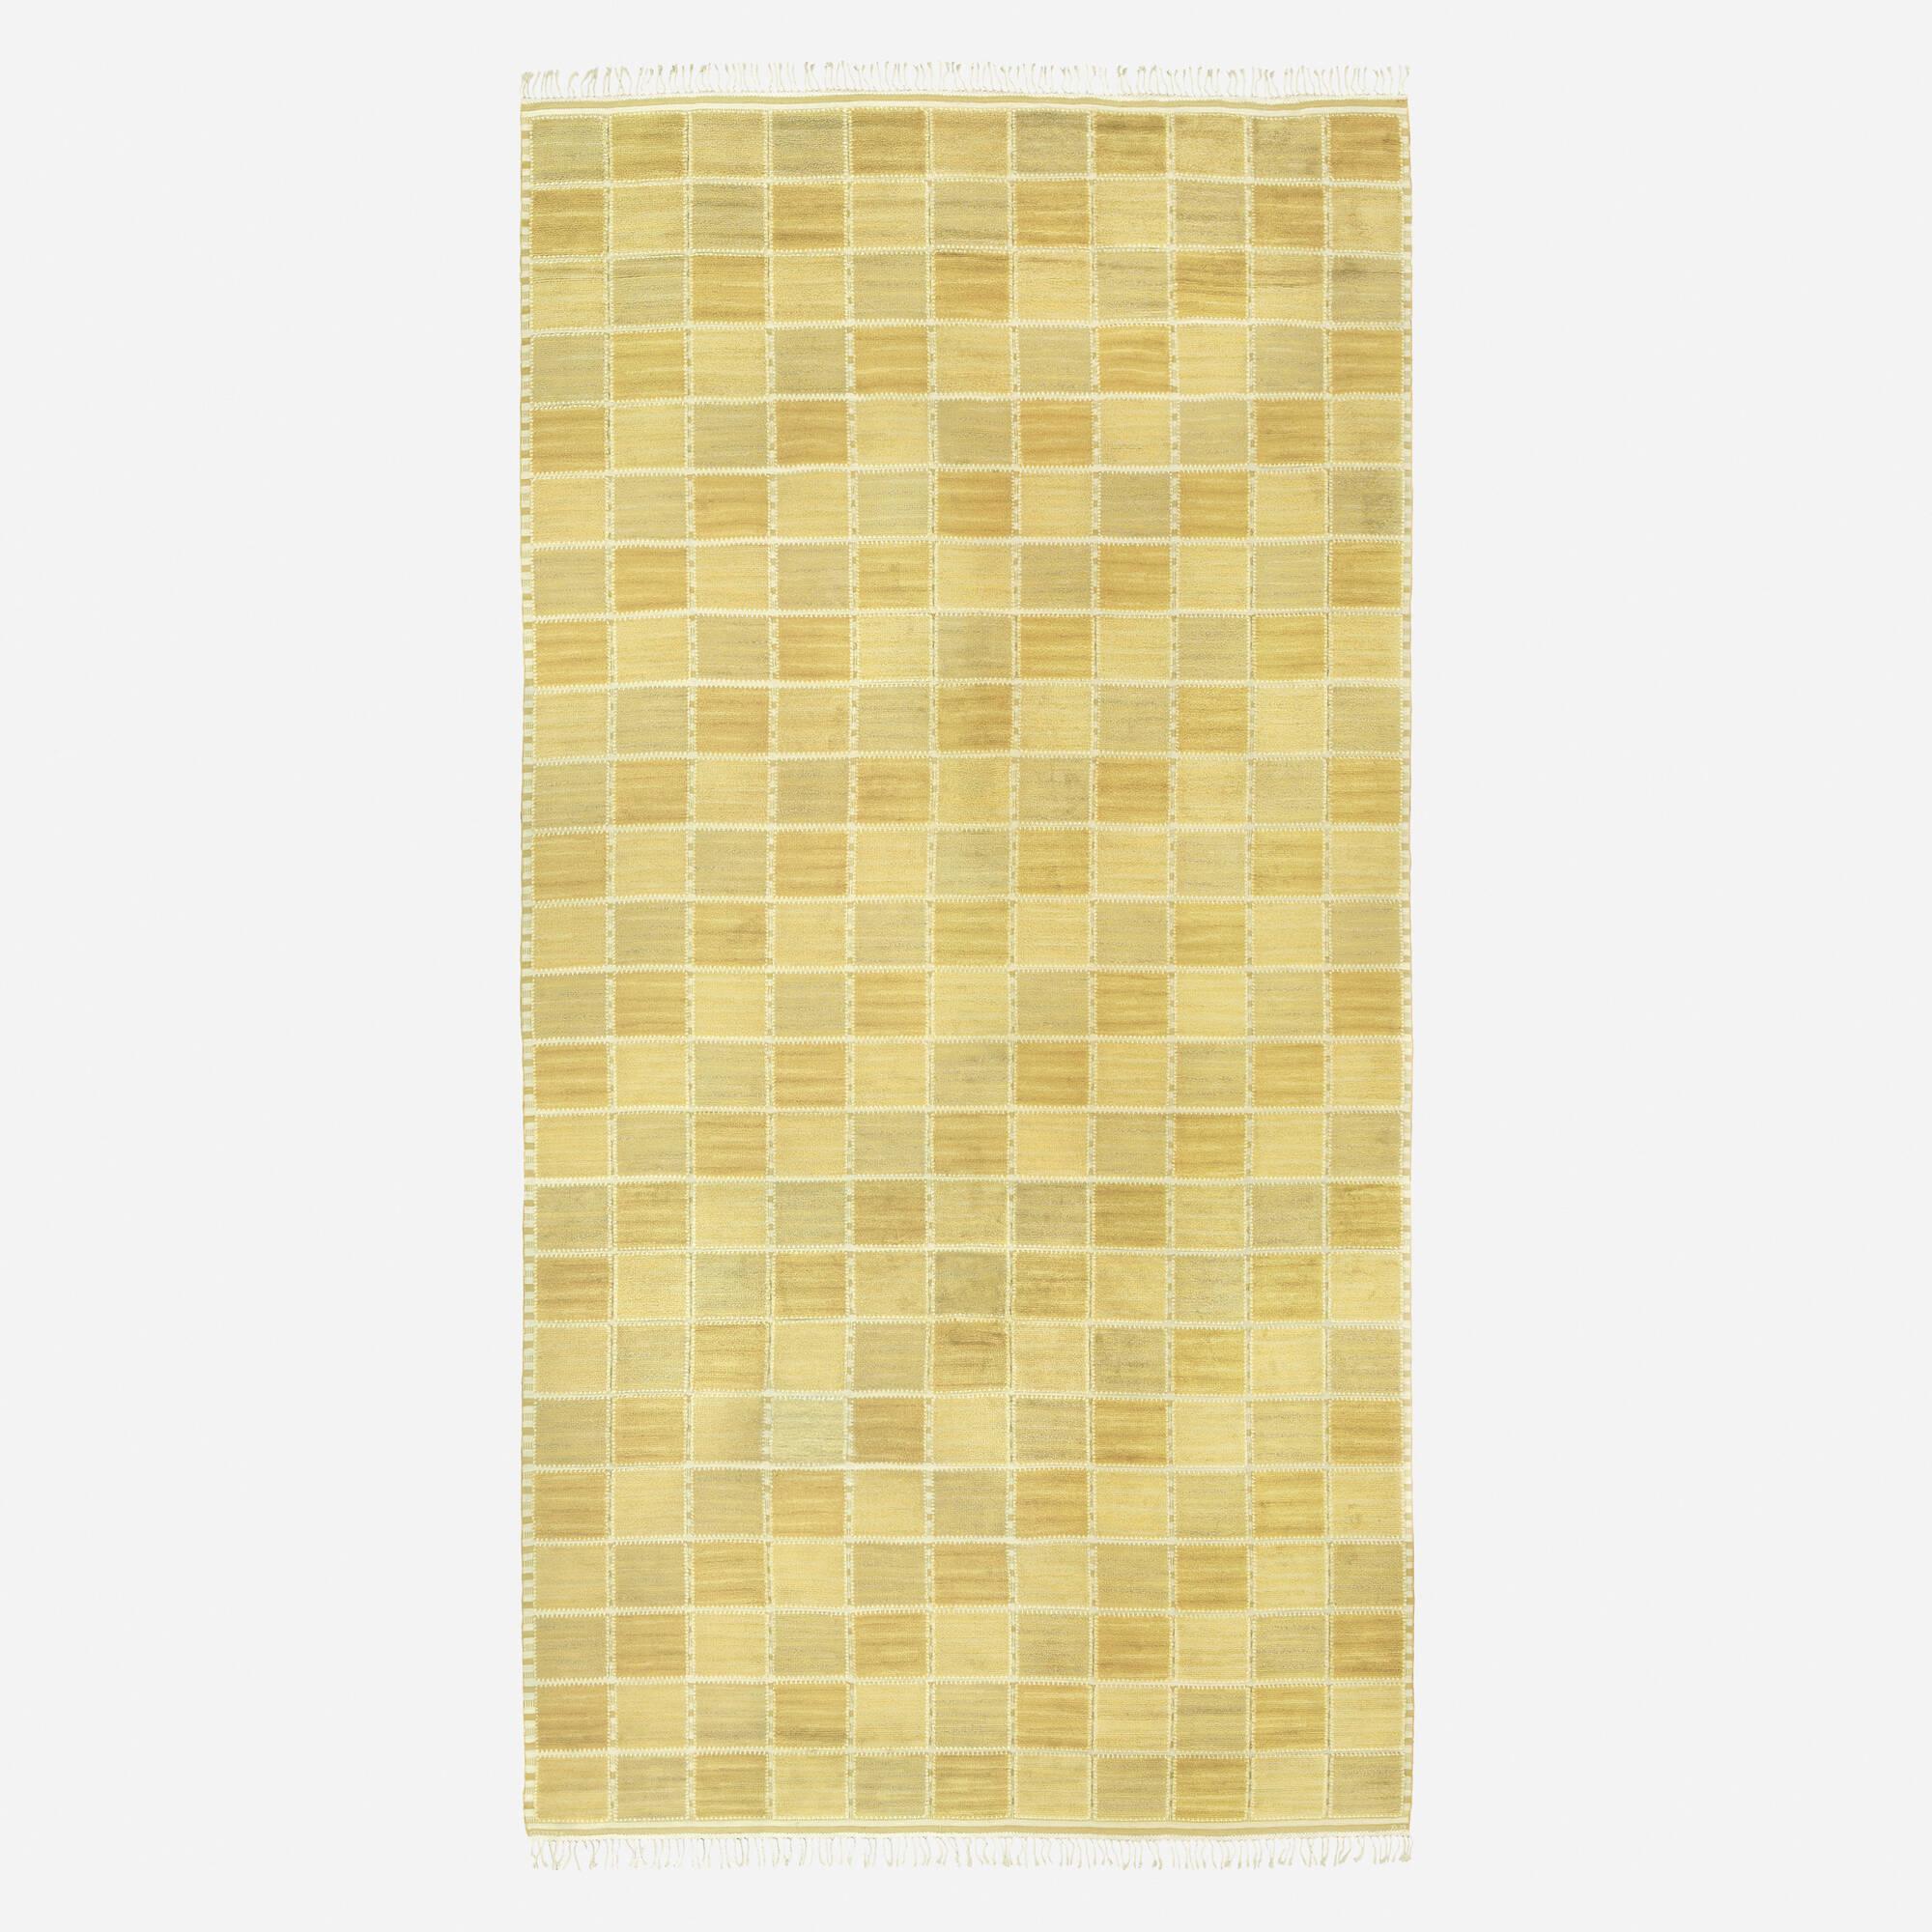 115: Barbro Nilsson / Gyllenrutan half-pile carpet (1 of 1)